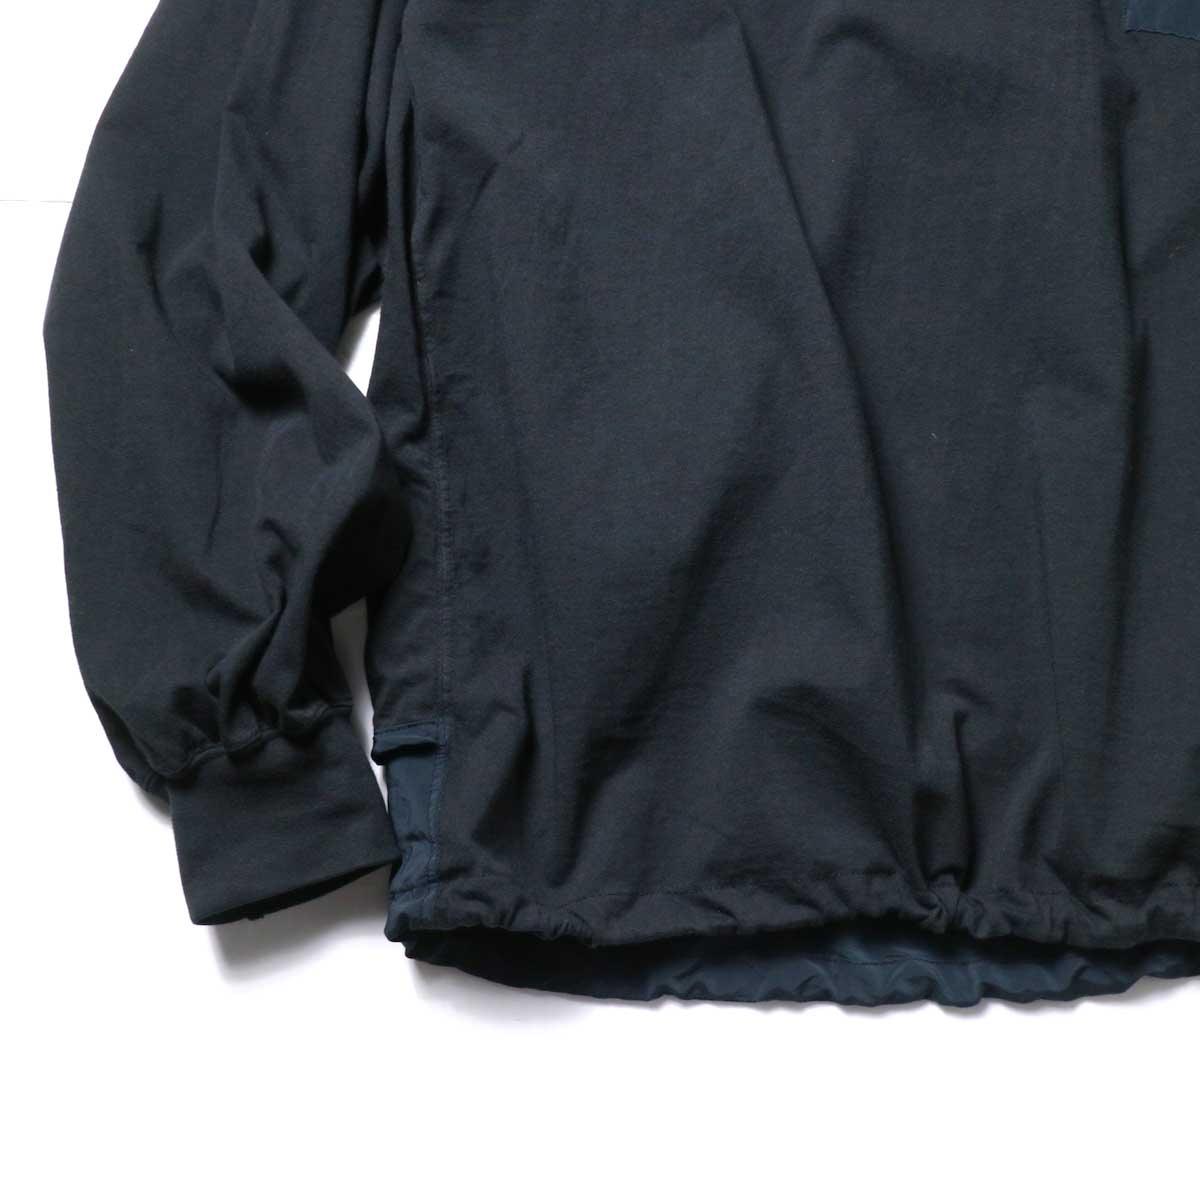 REMI RELIEF / ブリーフィング 30/天竺ベンチレーションロンT (Black)袖、裾